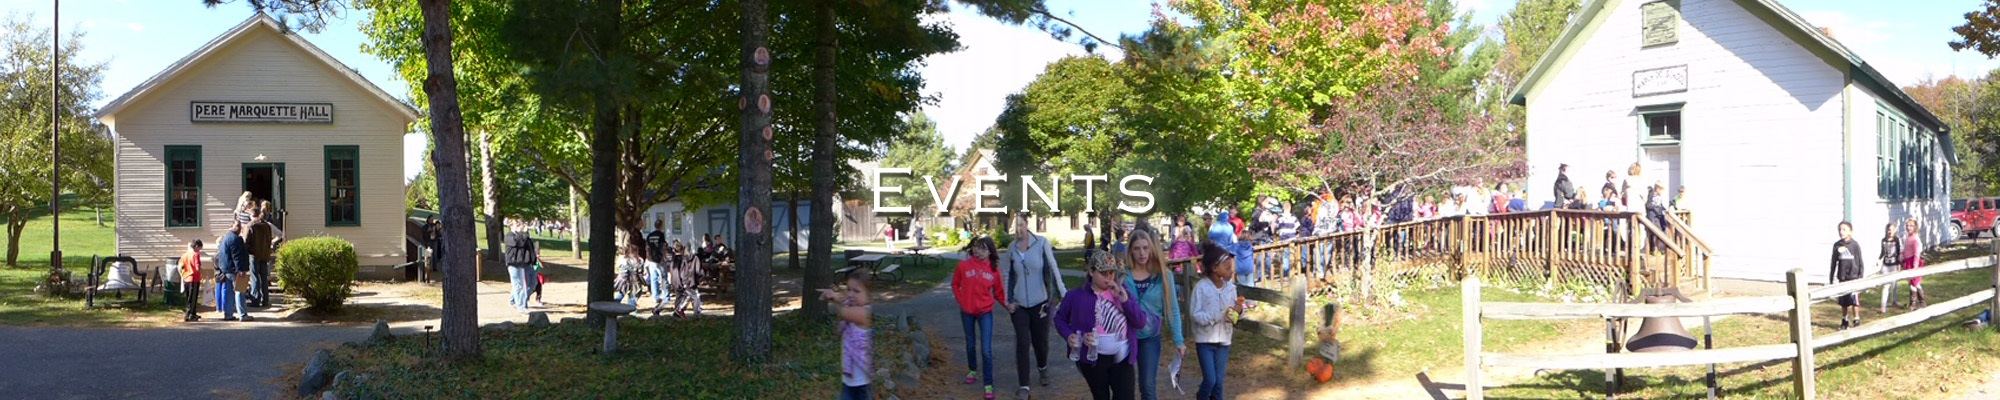 Events & Tours - Historic White Pine Village